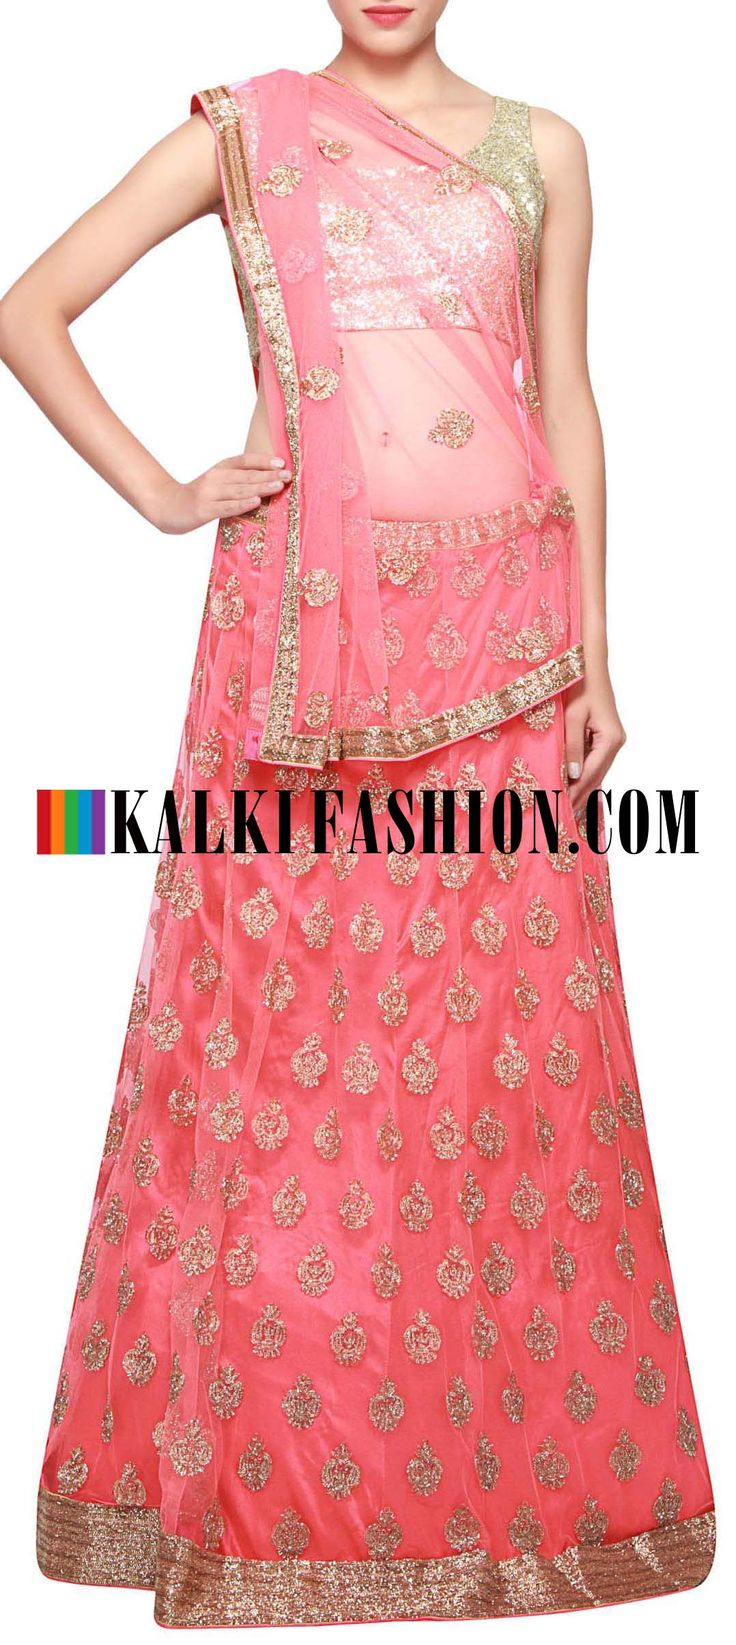 Get this beautiful lehenga here: http://www.kalkifashion.com/pink-lehenga-adorn-in-zari-butti-only-on-kalki.html Free shipping worldwide.